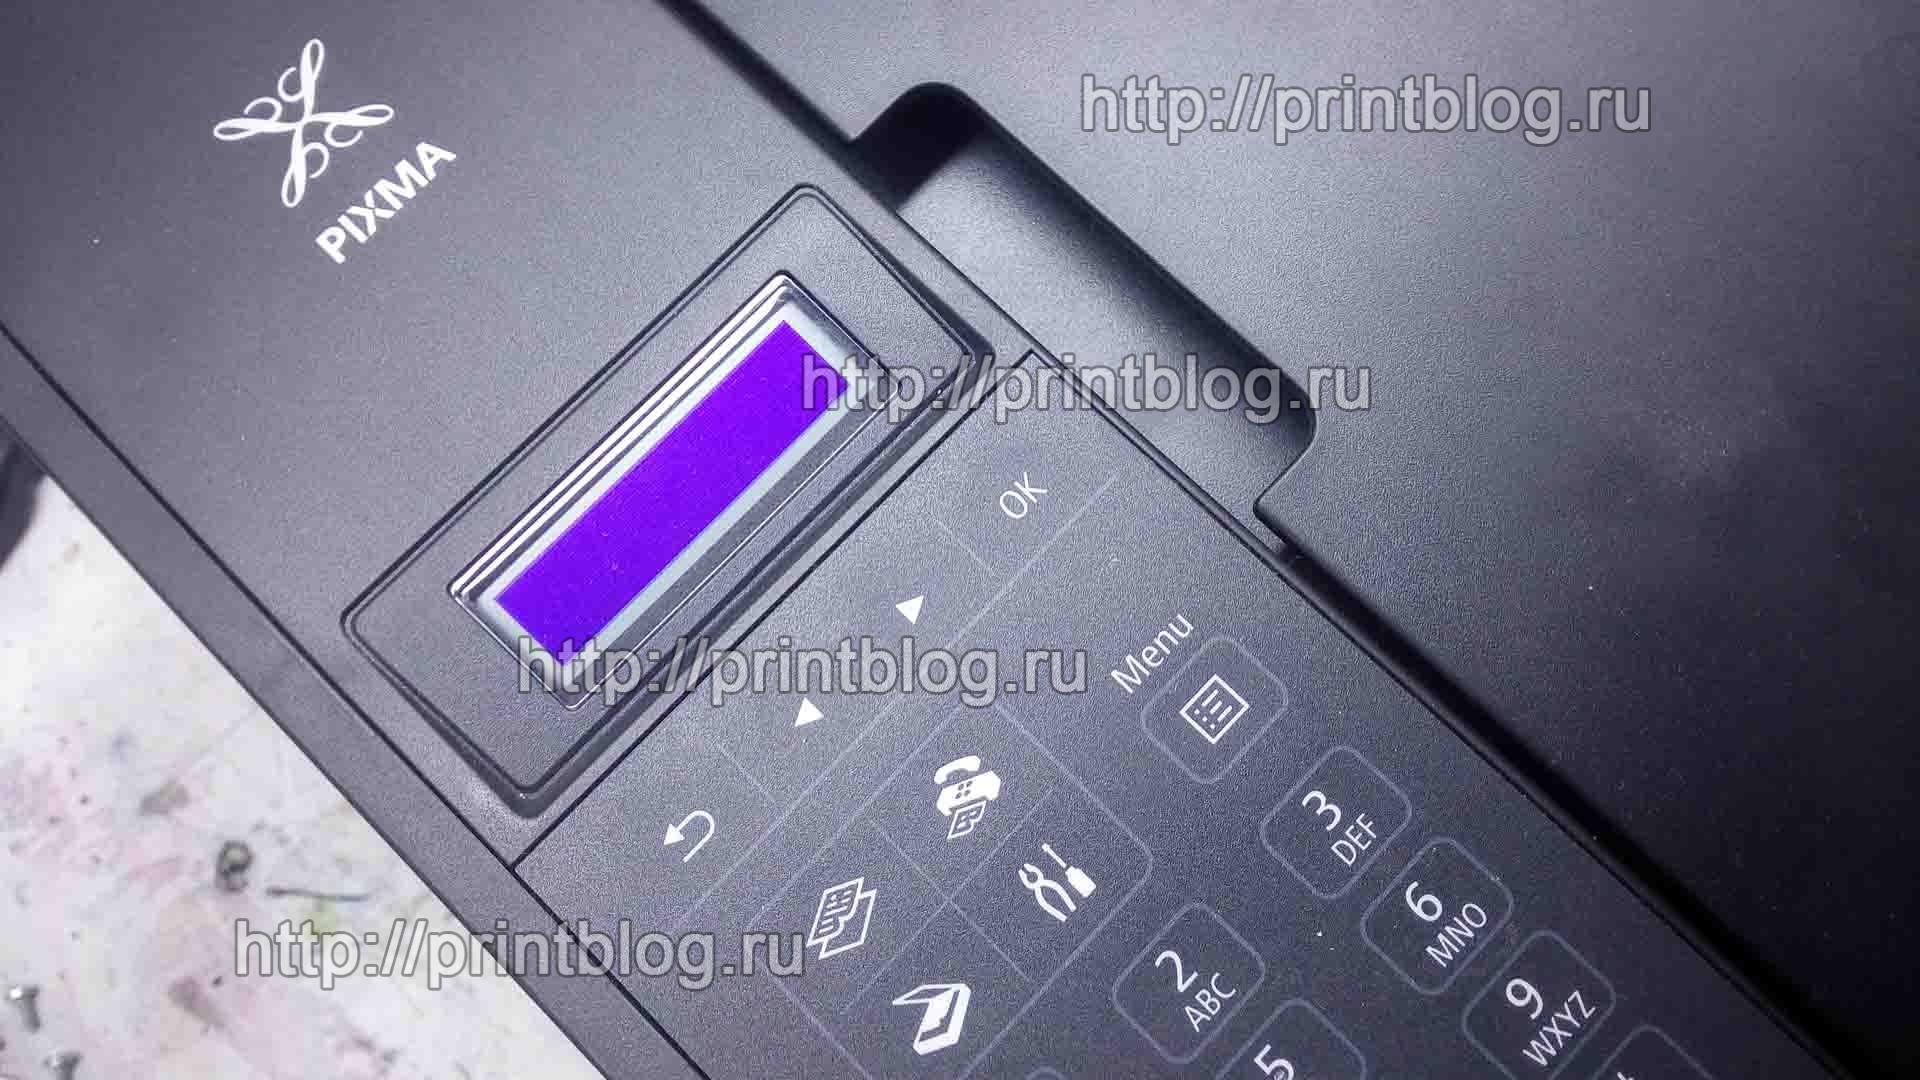 Service tool 4905 Canon PIXMA MX494